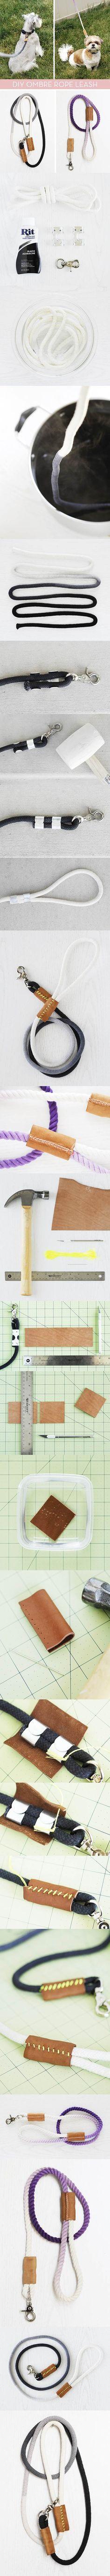 DIY Modern Dip-Dyed Rope Dog Leash